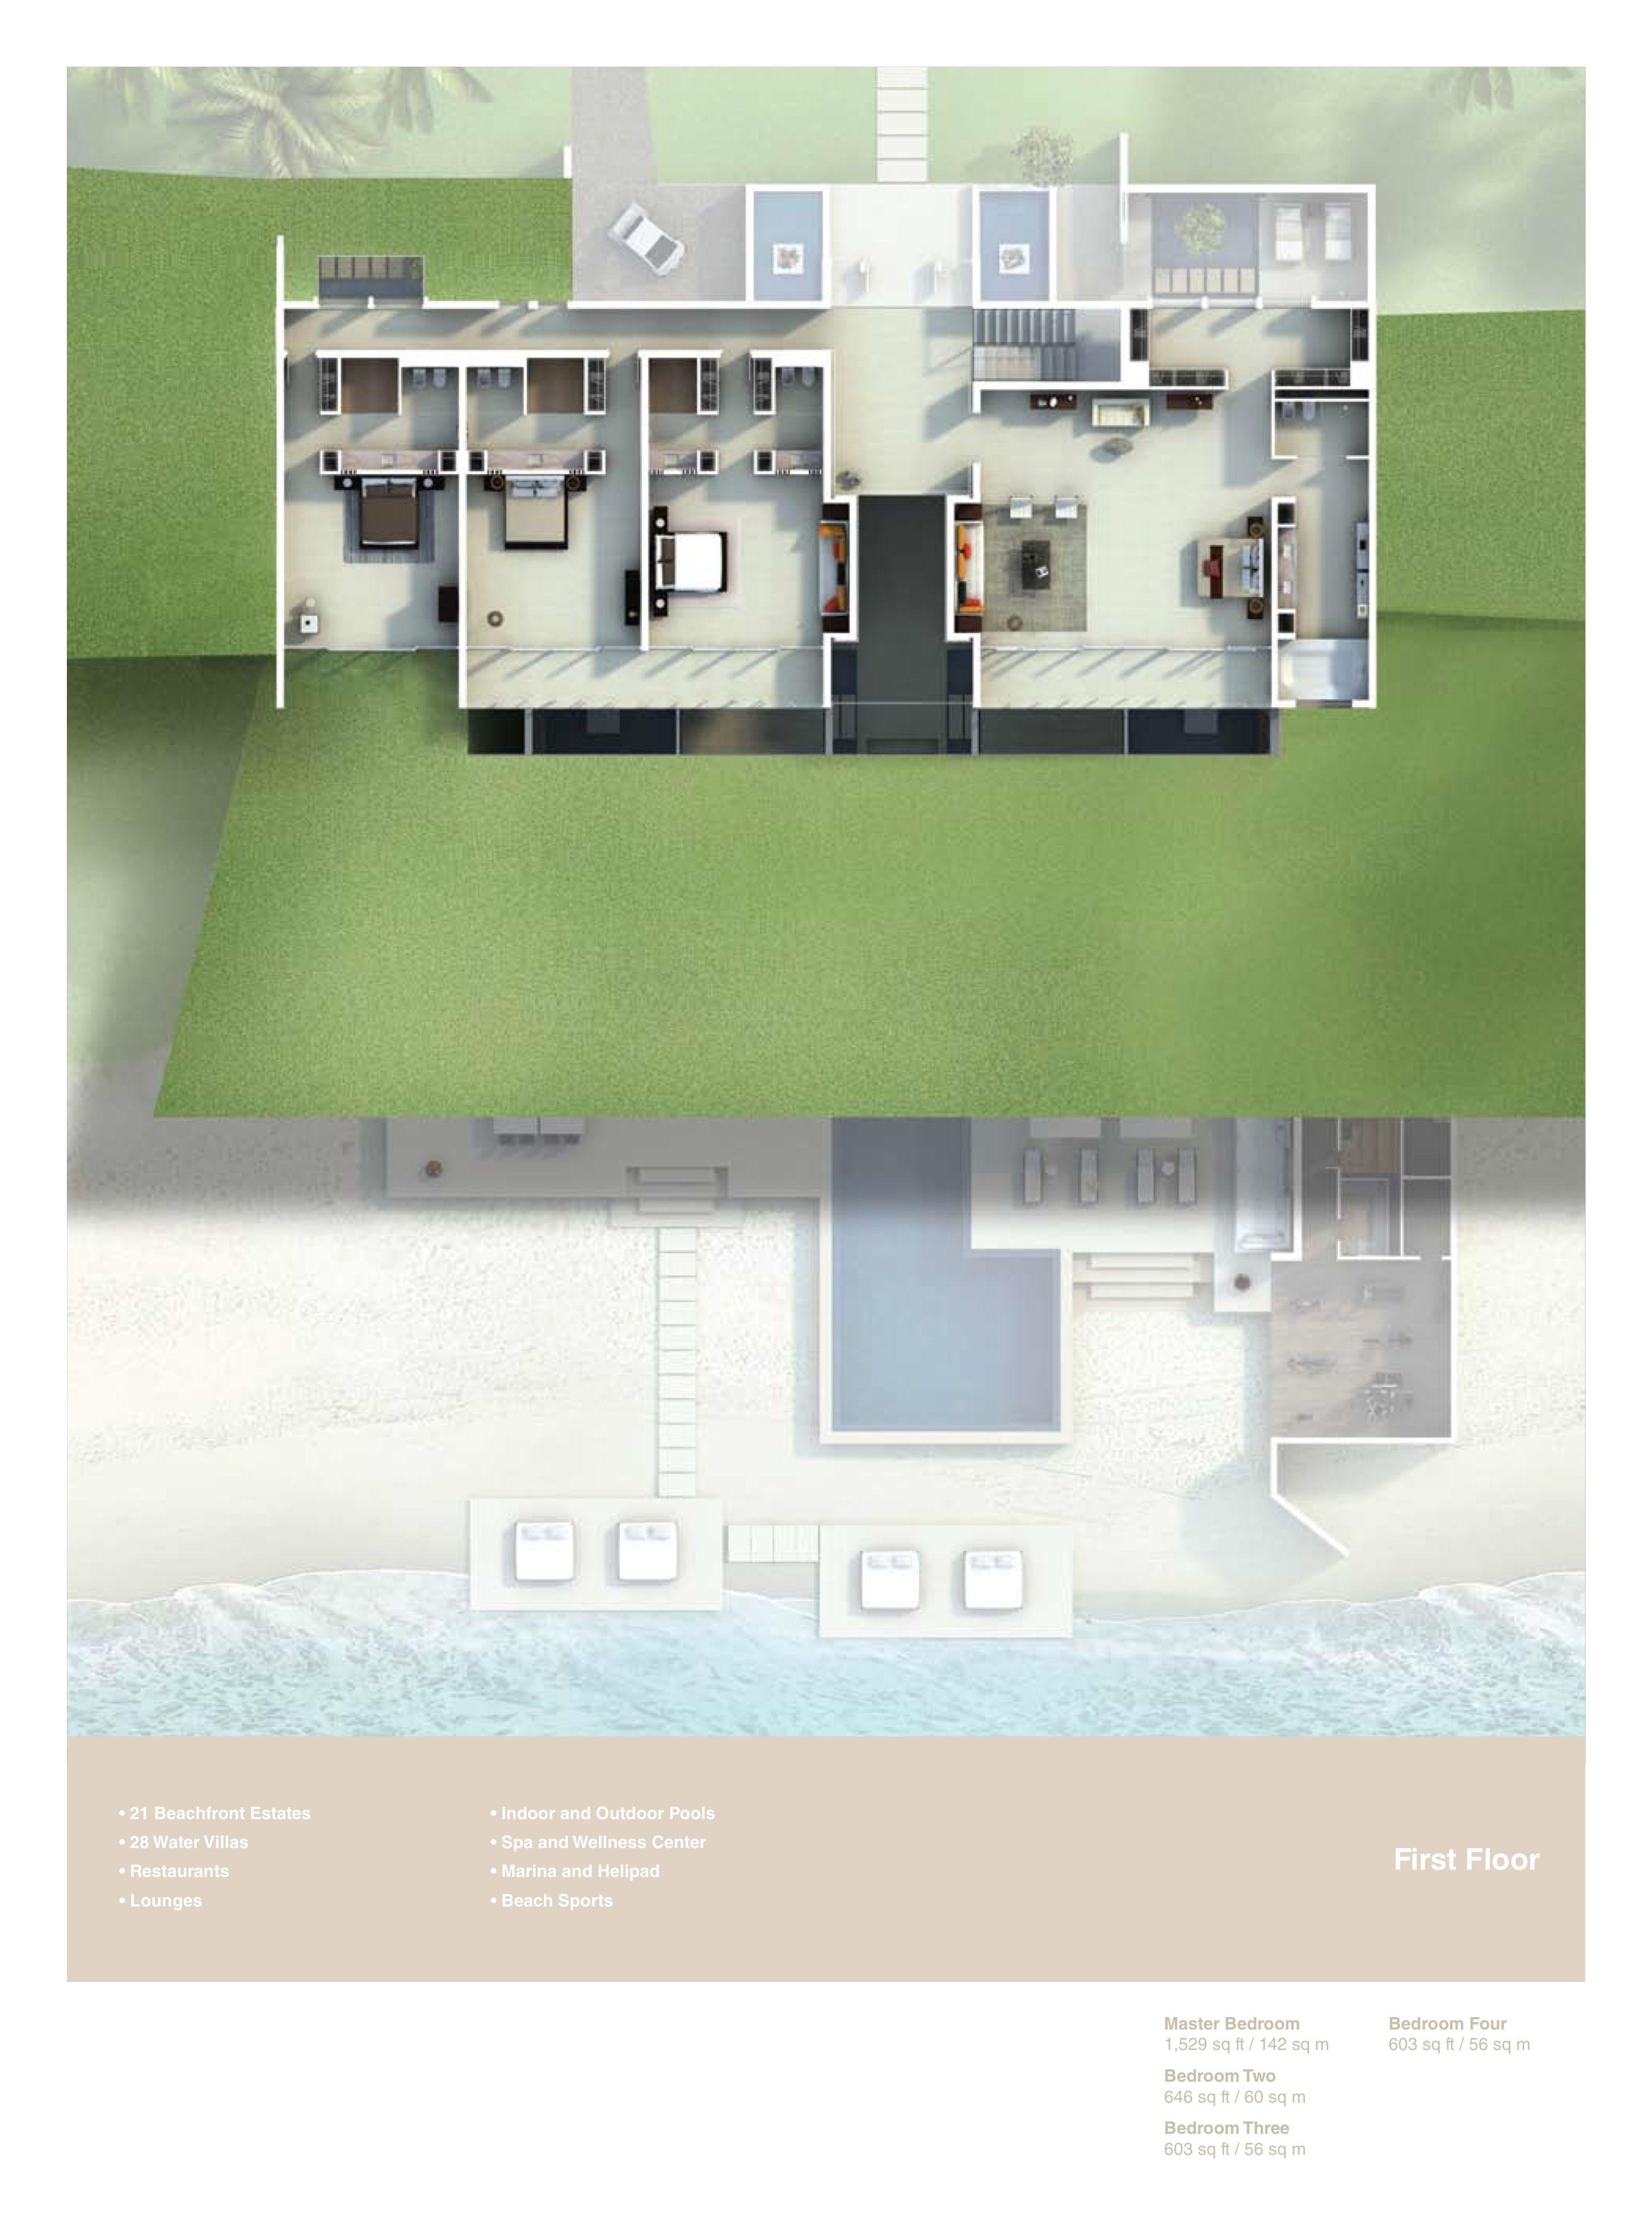 Nurai Beachfront Estate Villa Floor Plans Nurai Island Abu Dhabi Uae Plantas De Casas Projetos De Casas Projeto Arquitetura